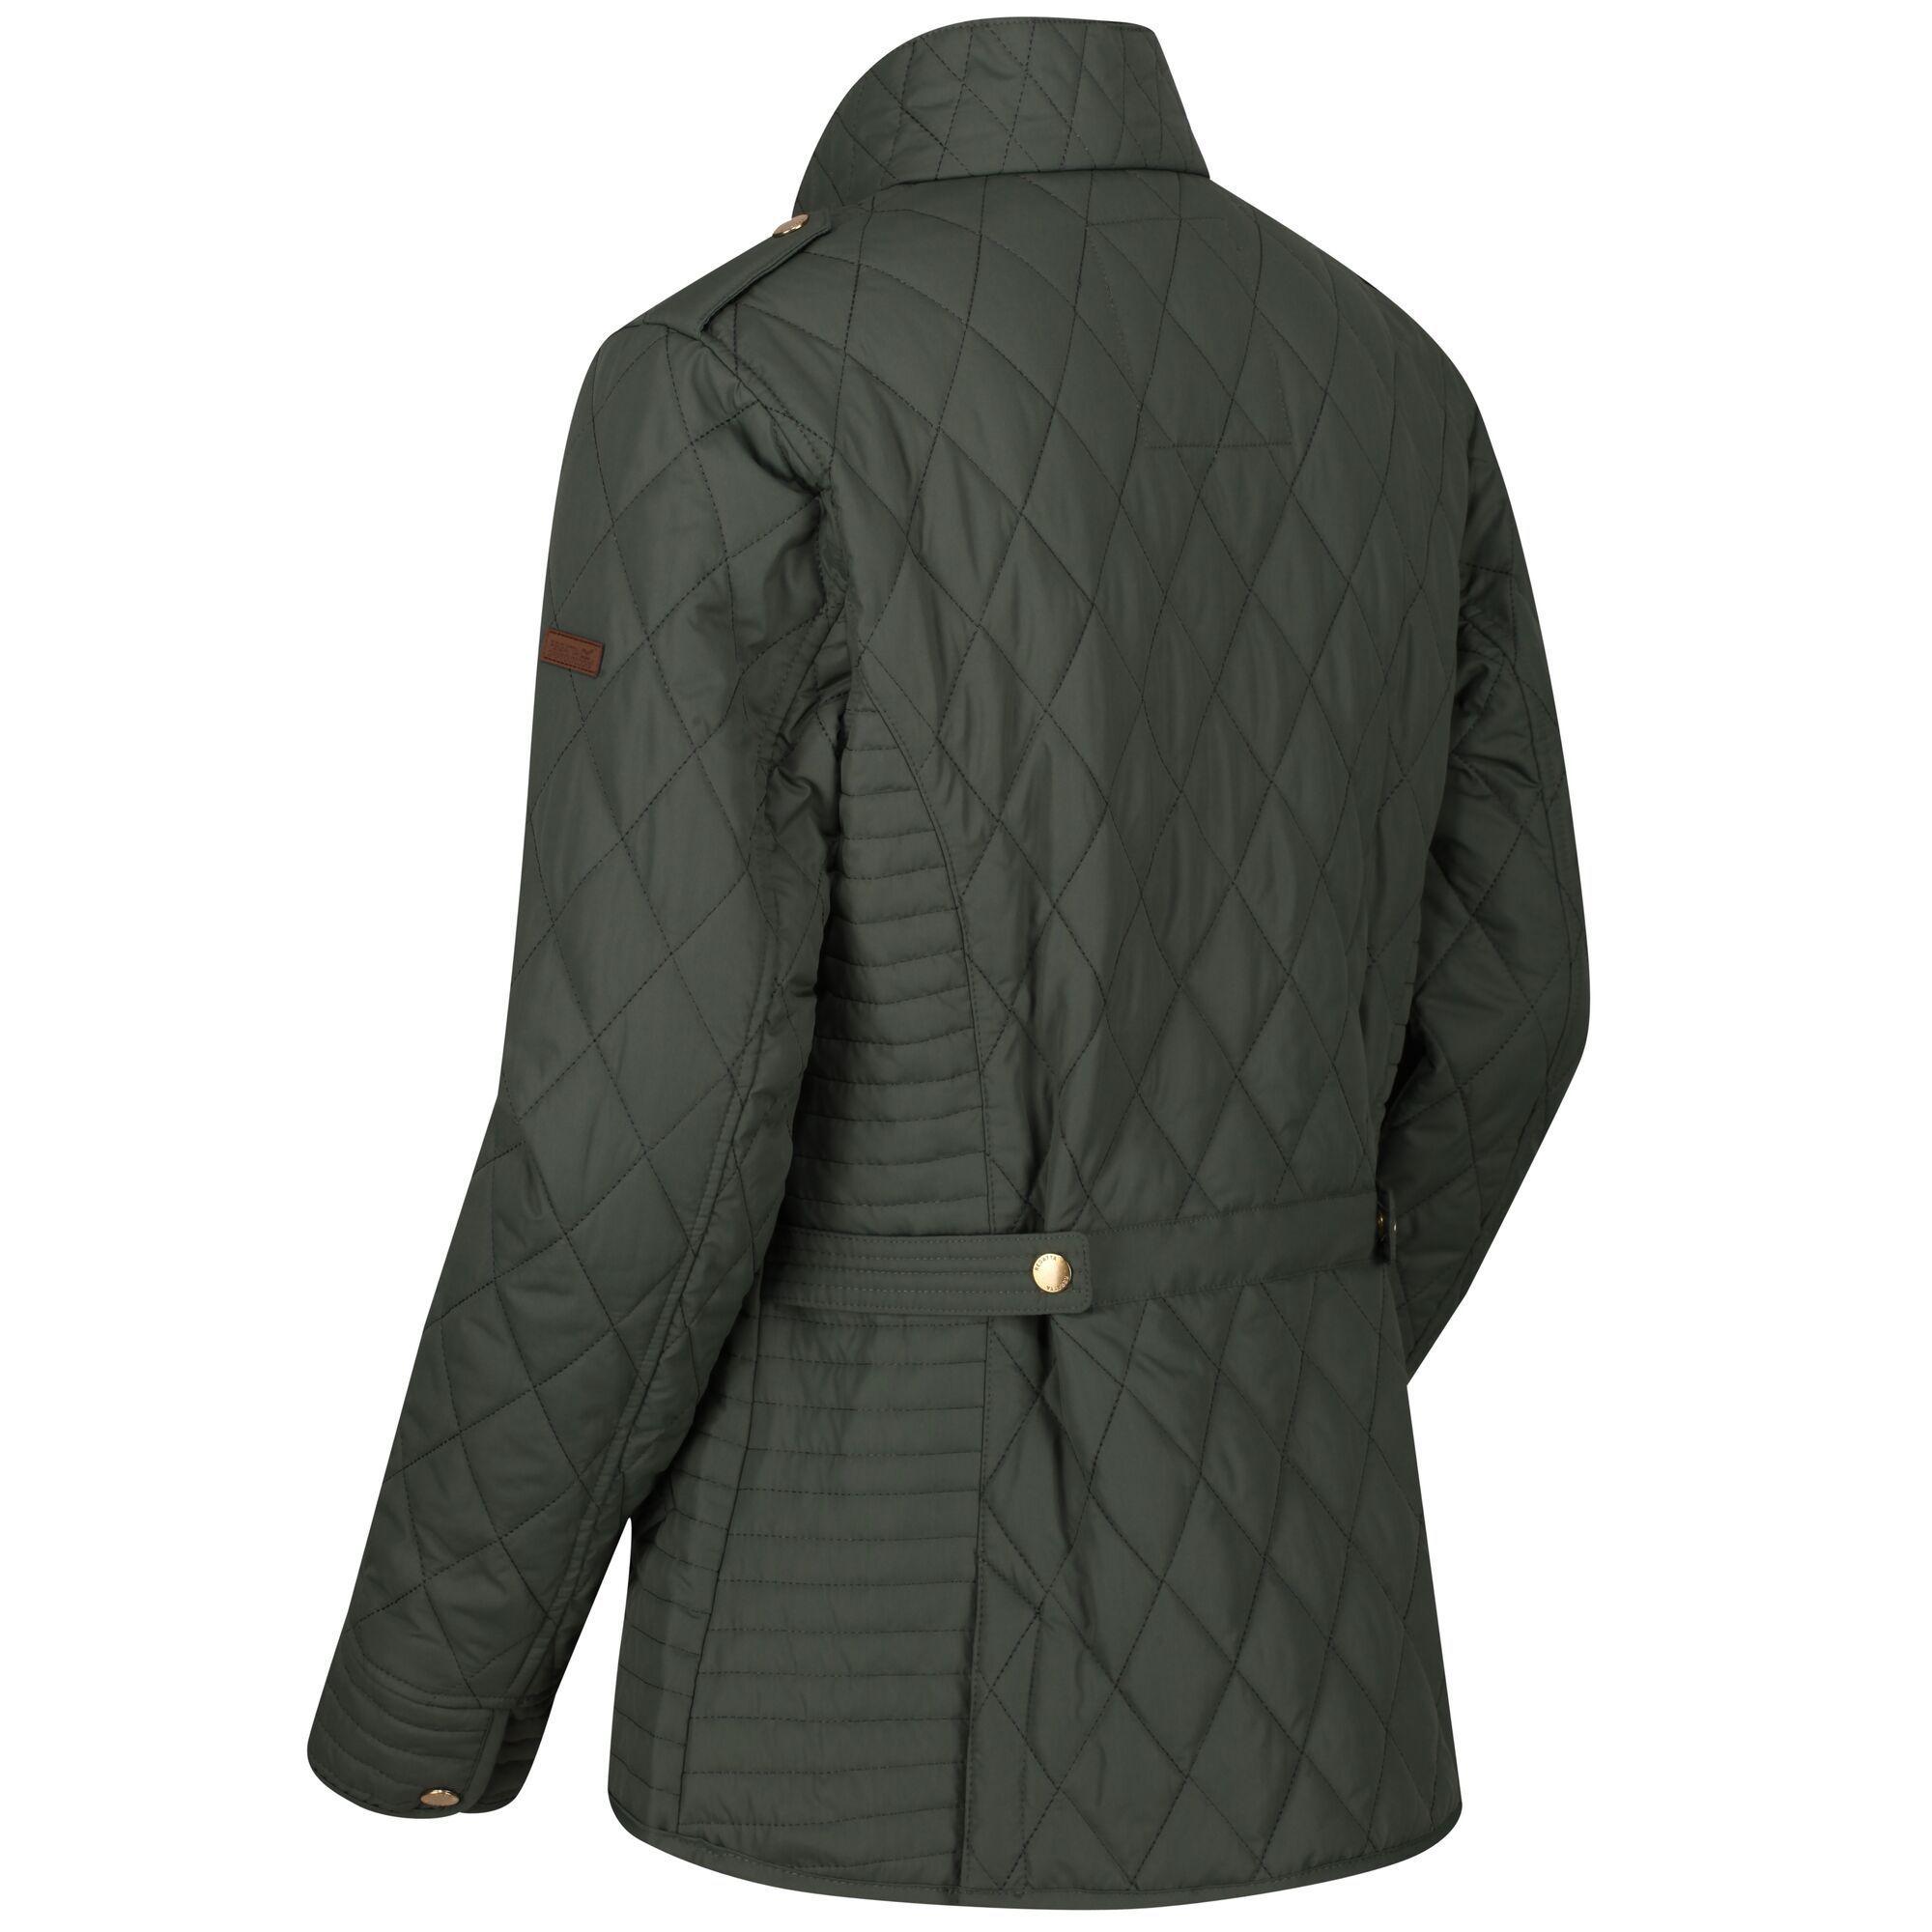 Regatta Women's Carita Quilted Jacket